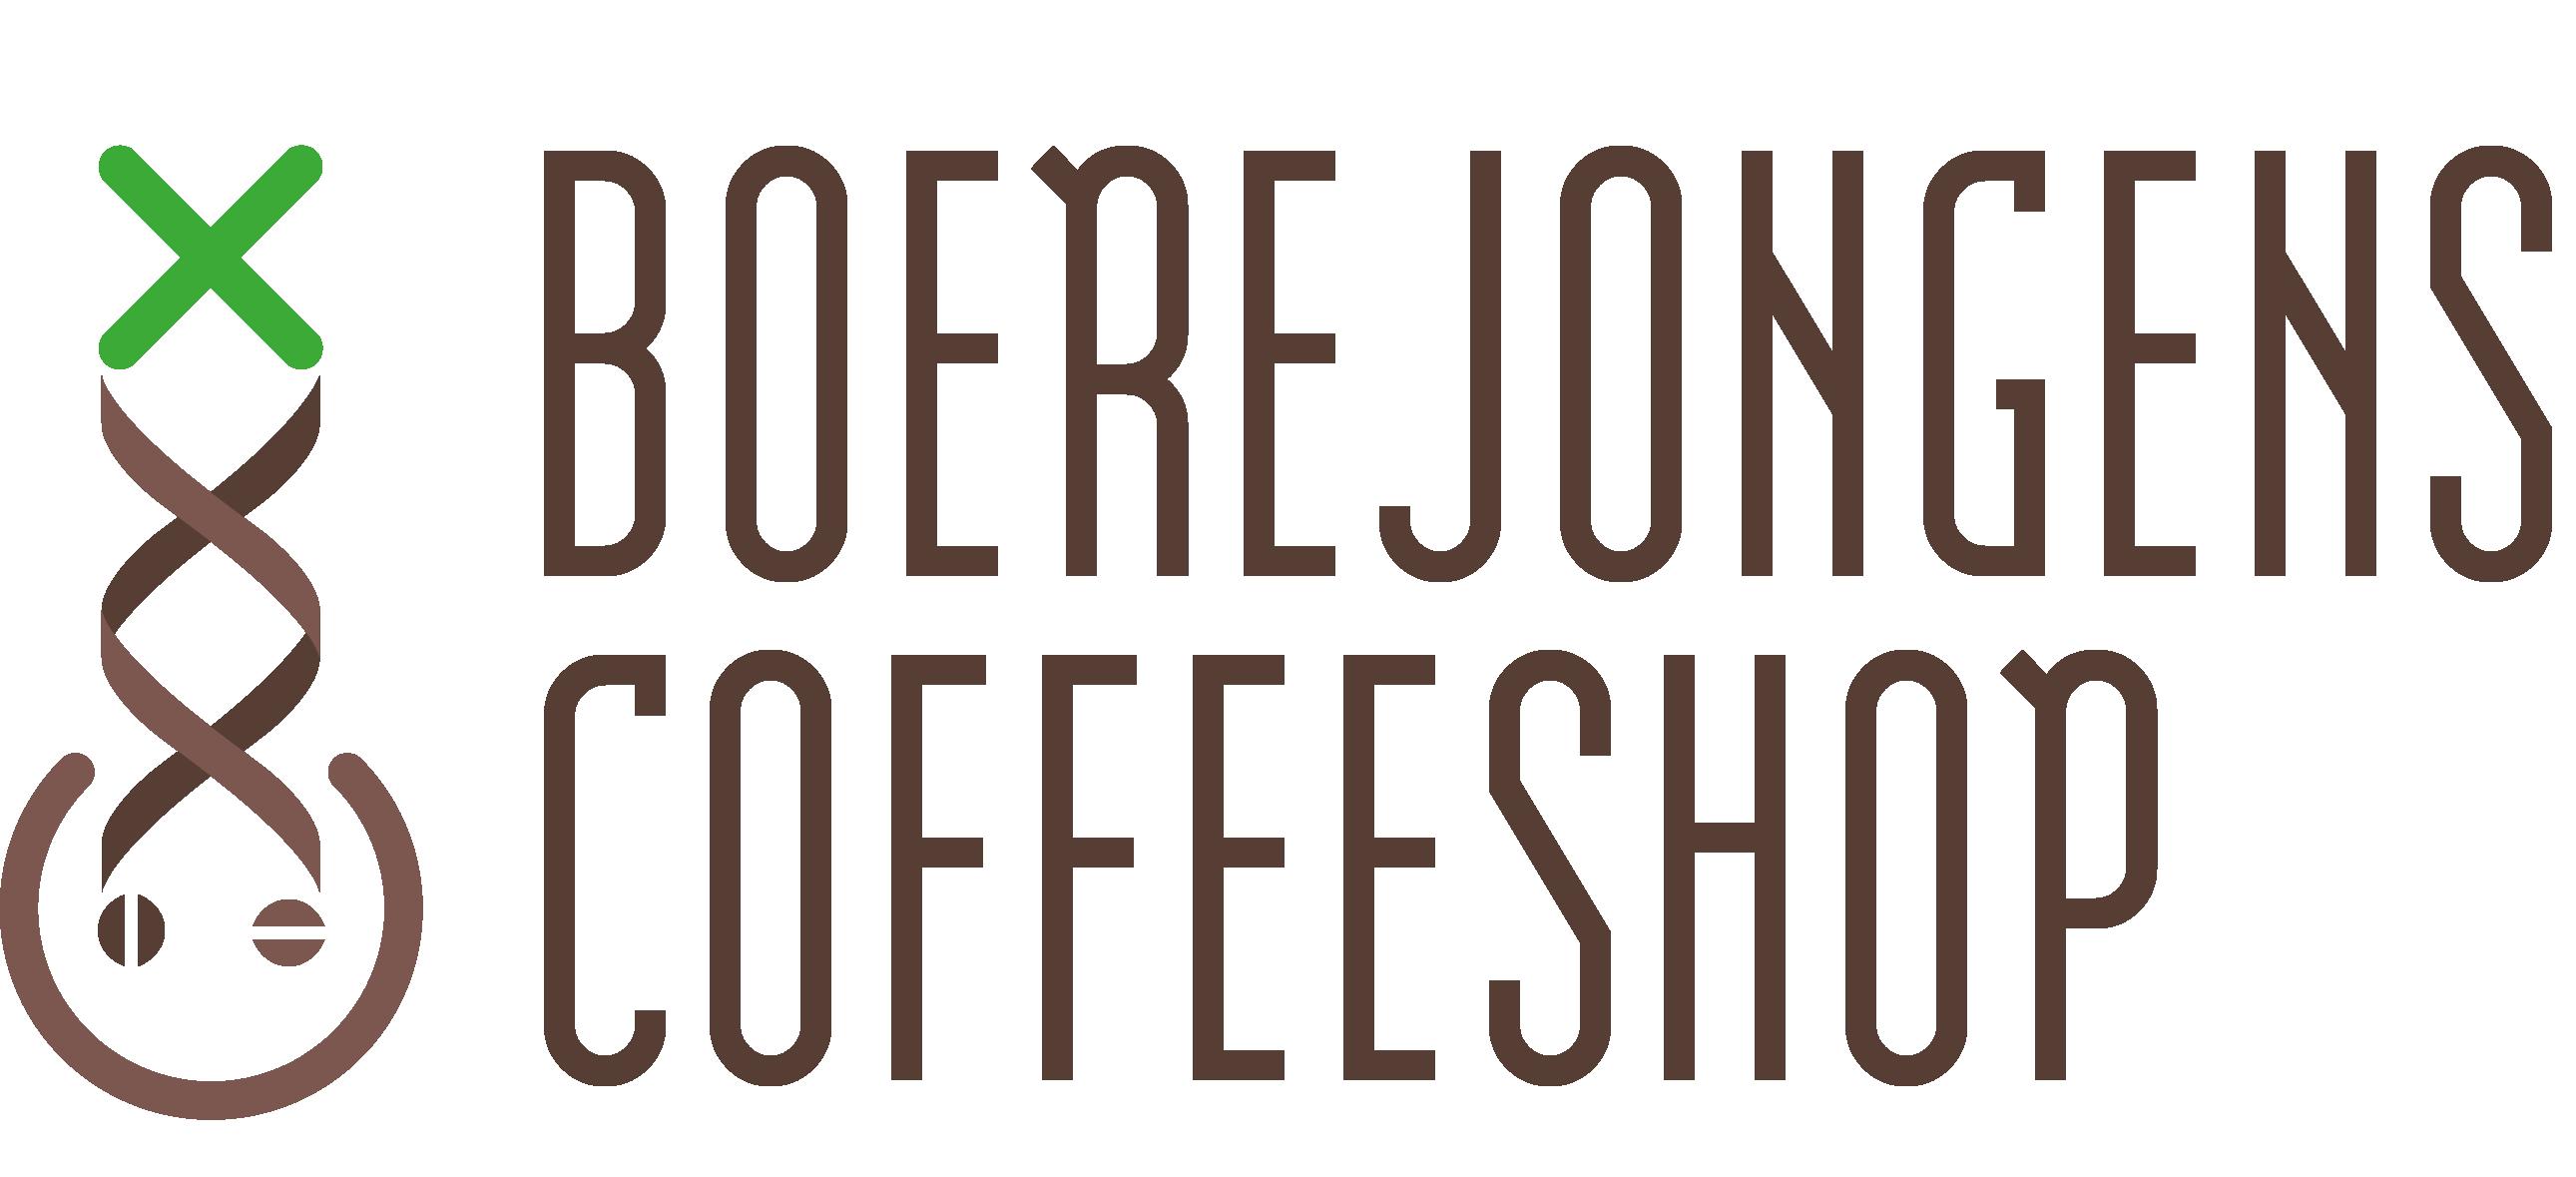 Boerejongens logo